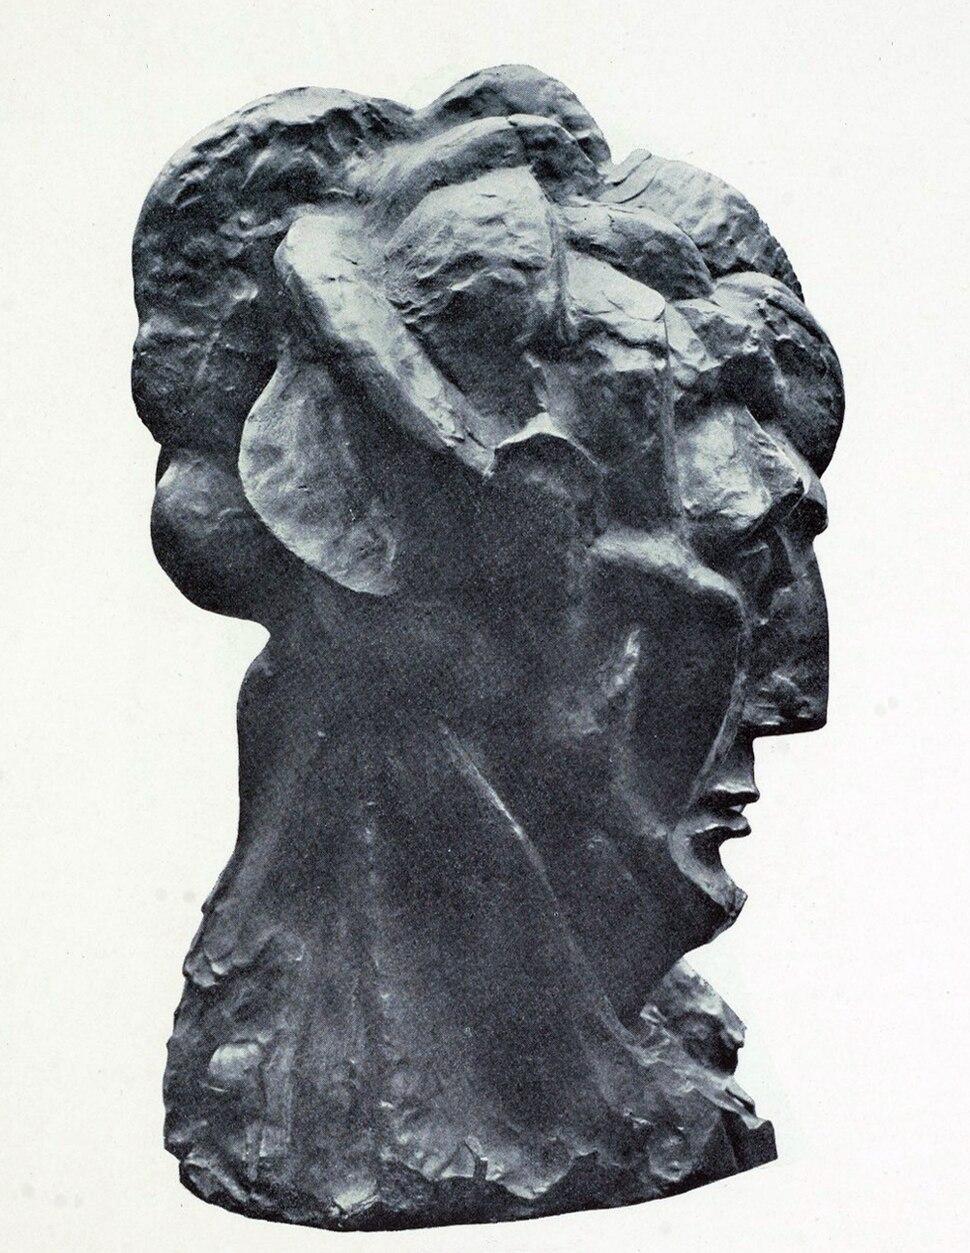 Pablo Picasso, 1909–10, Head of a Woman (Fernande), modeled on Fernande Olivier (right side)